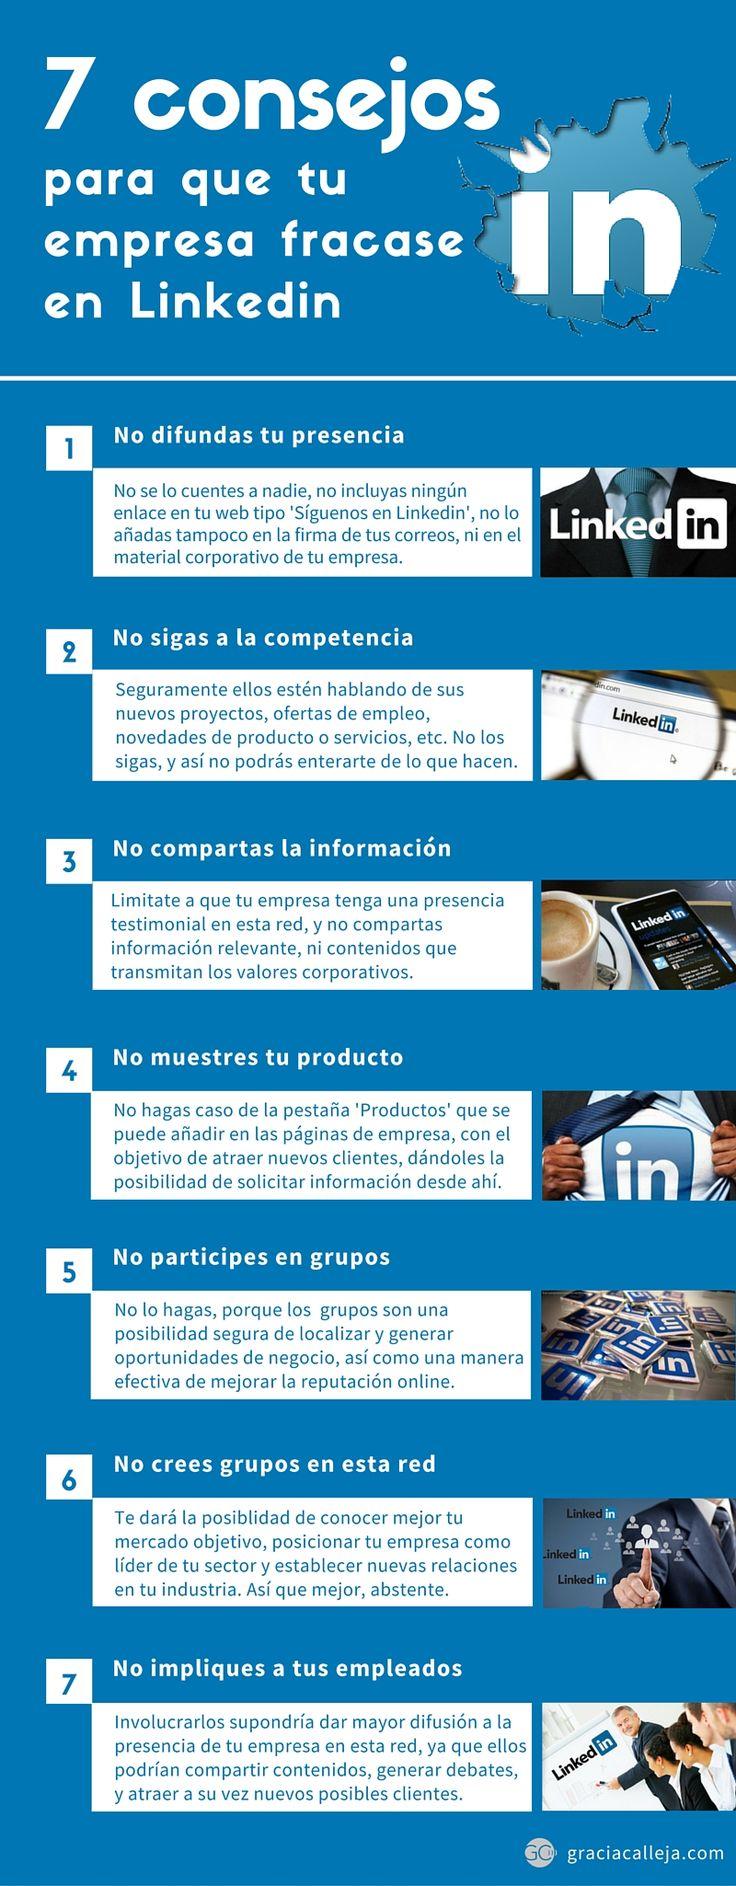 #comunicacioncorporativa #redessociales #linkedin #pymes